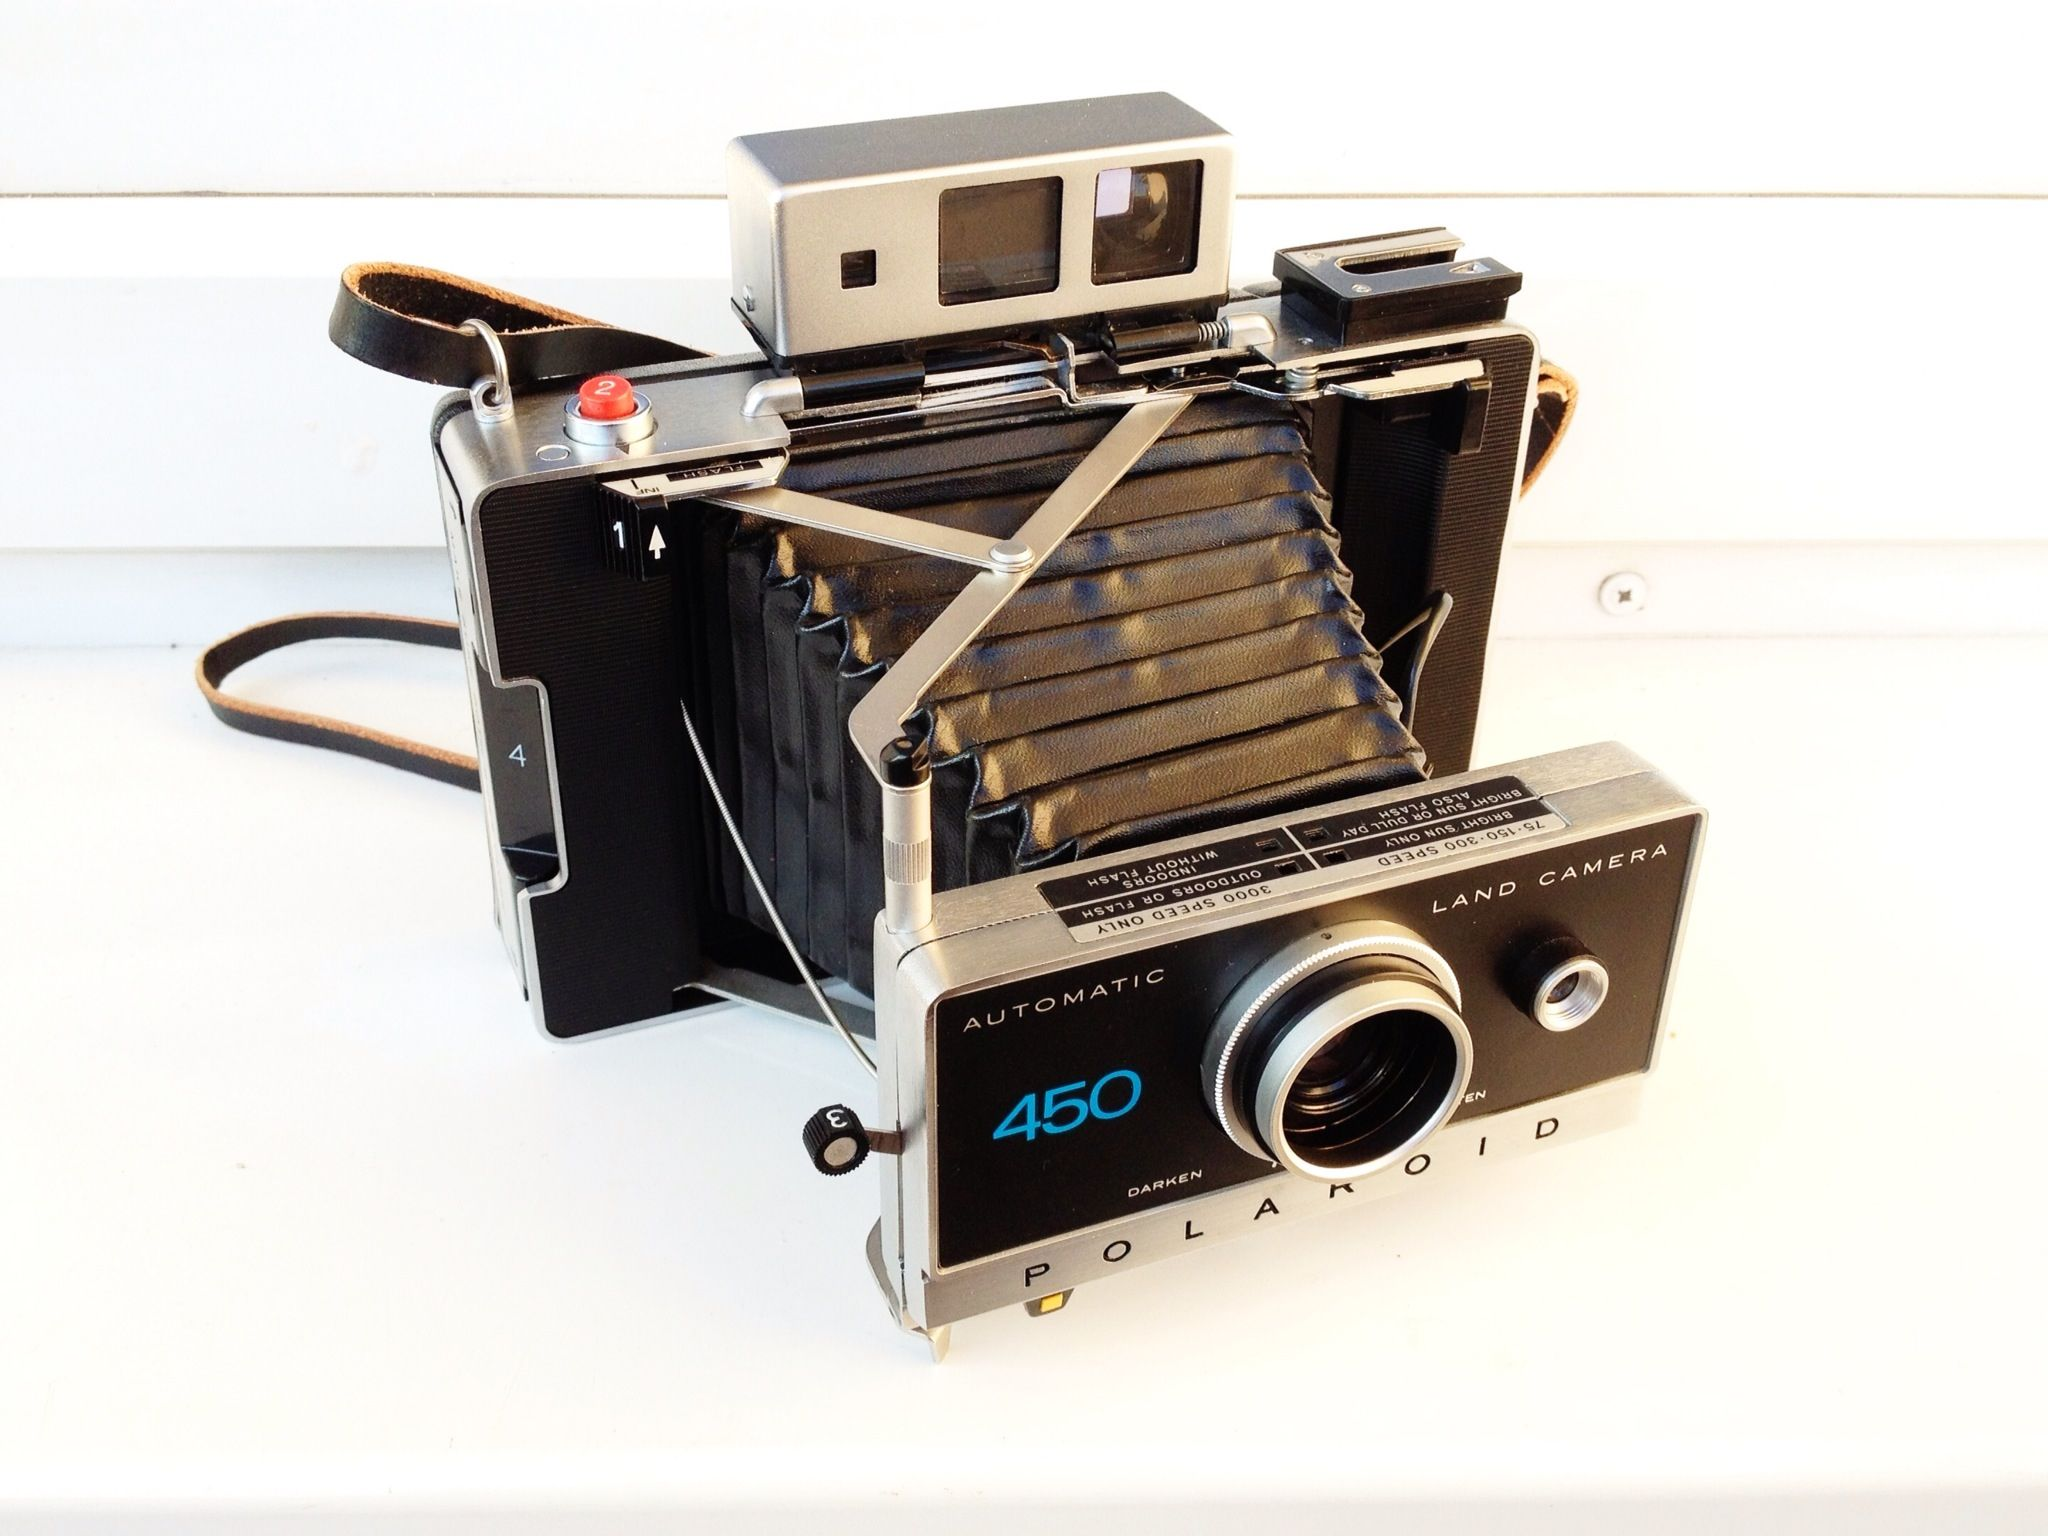 Polaroid Automatic 450 Land Camera (1970)